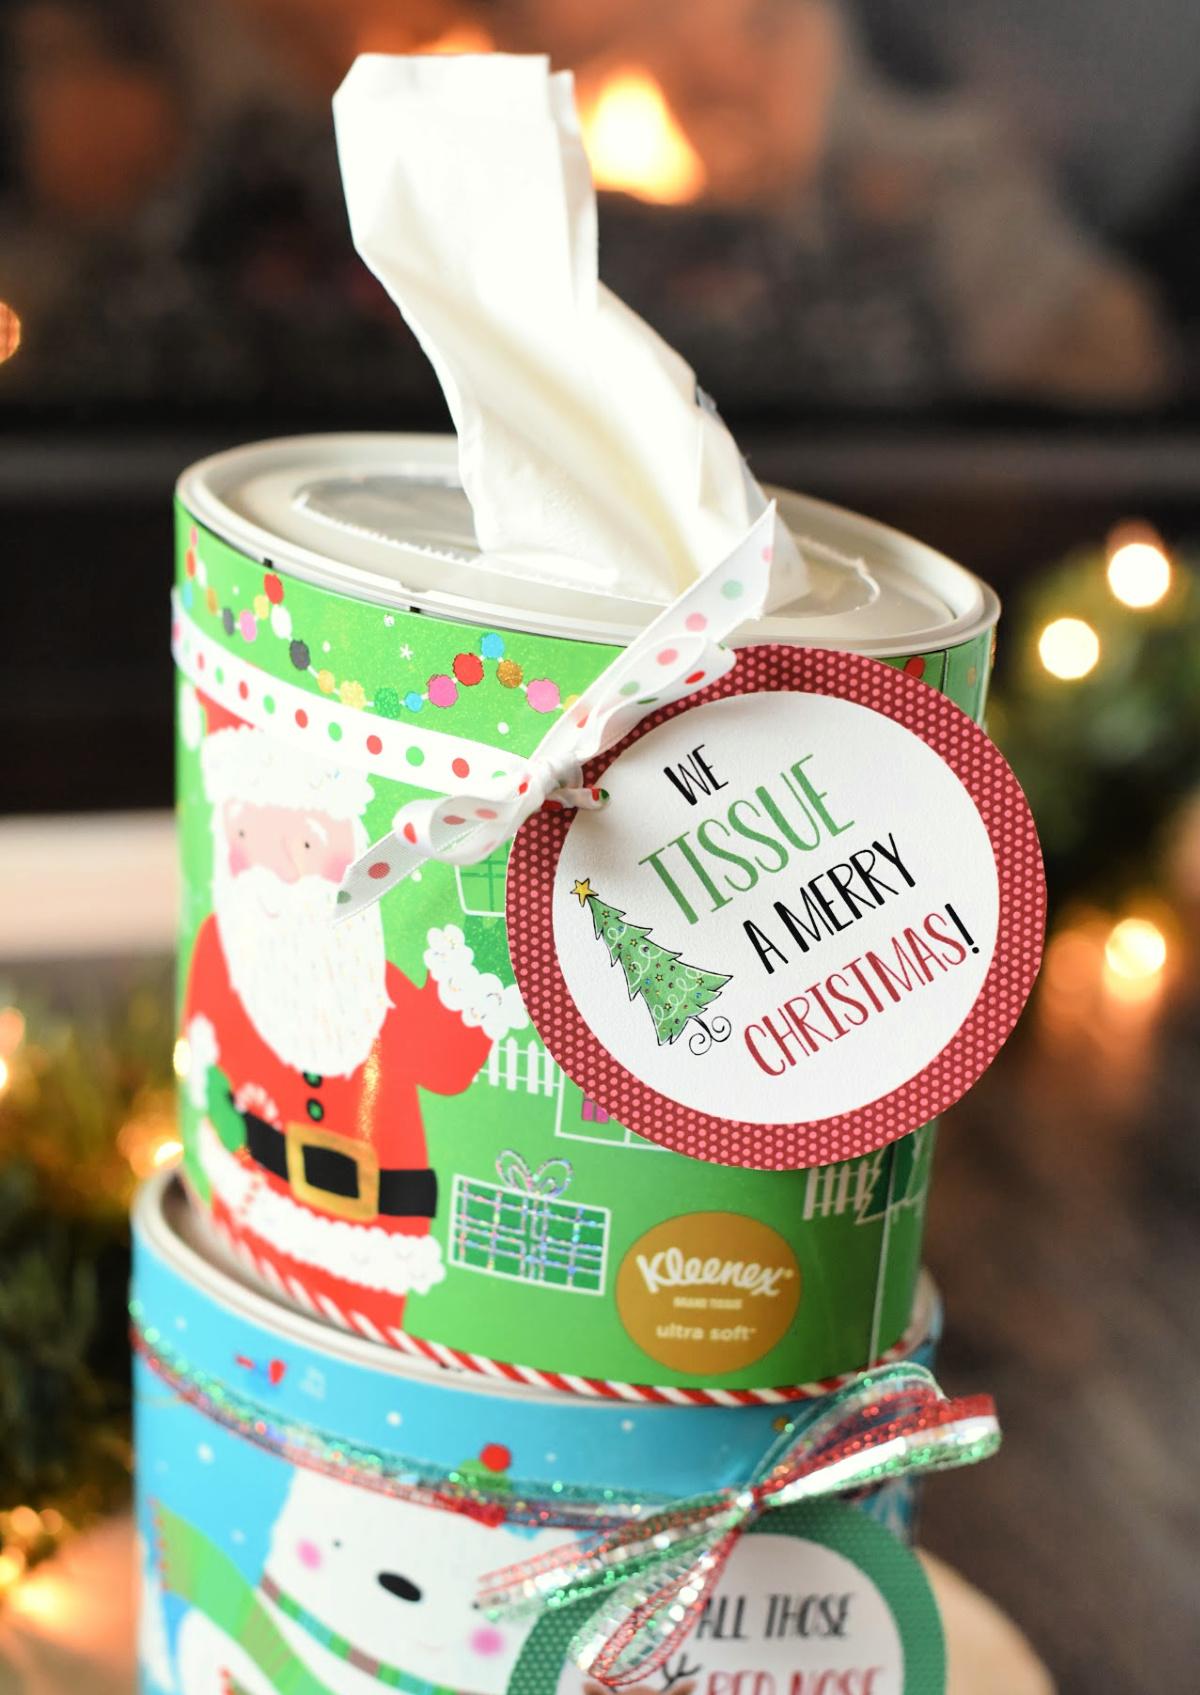 We Tissue a Merry Christmas Easy Neighbor Gift Idea